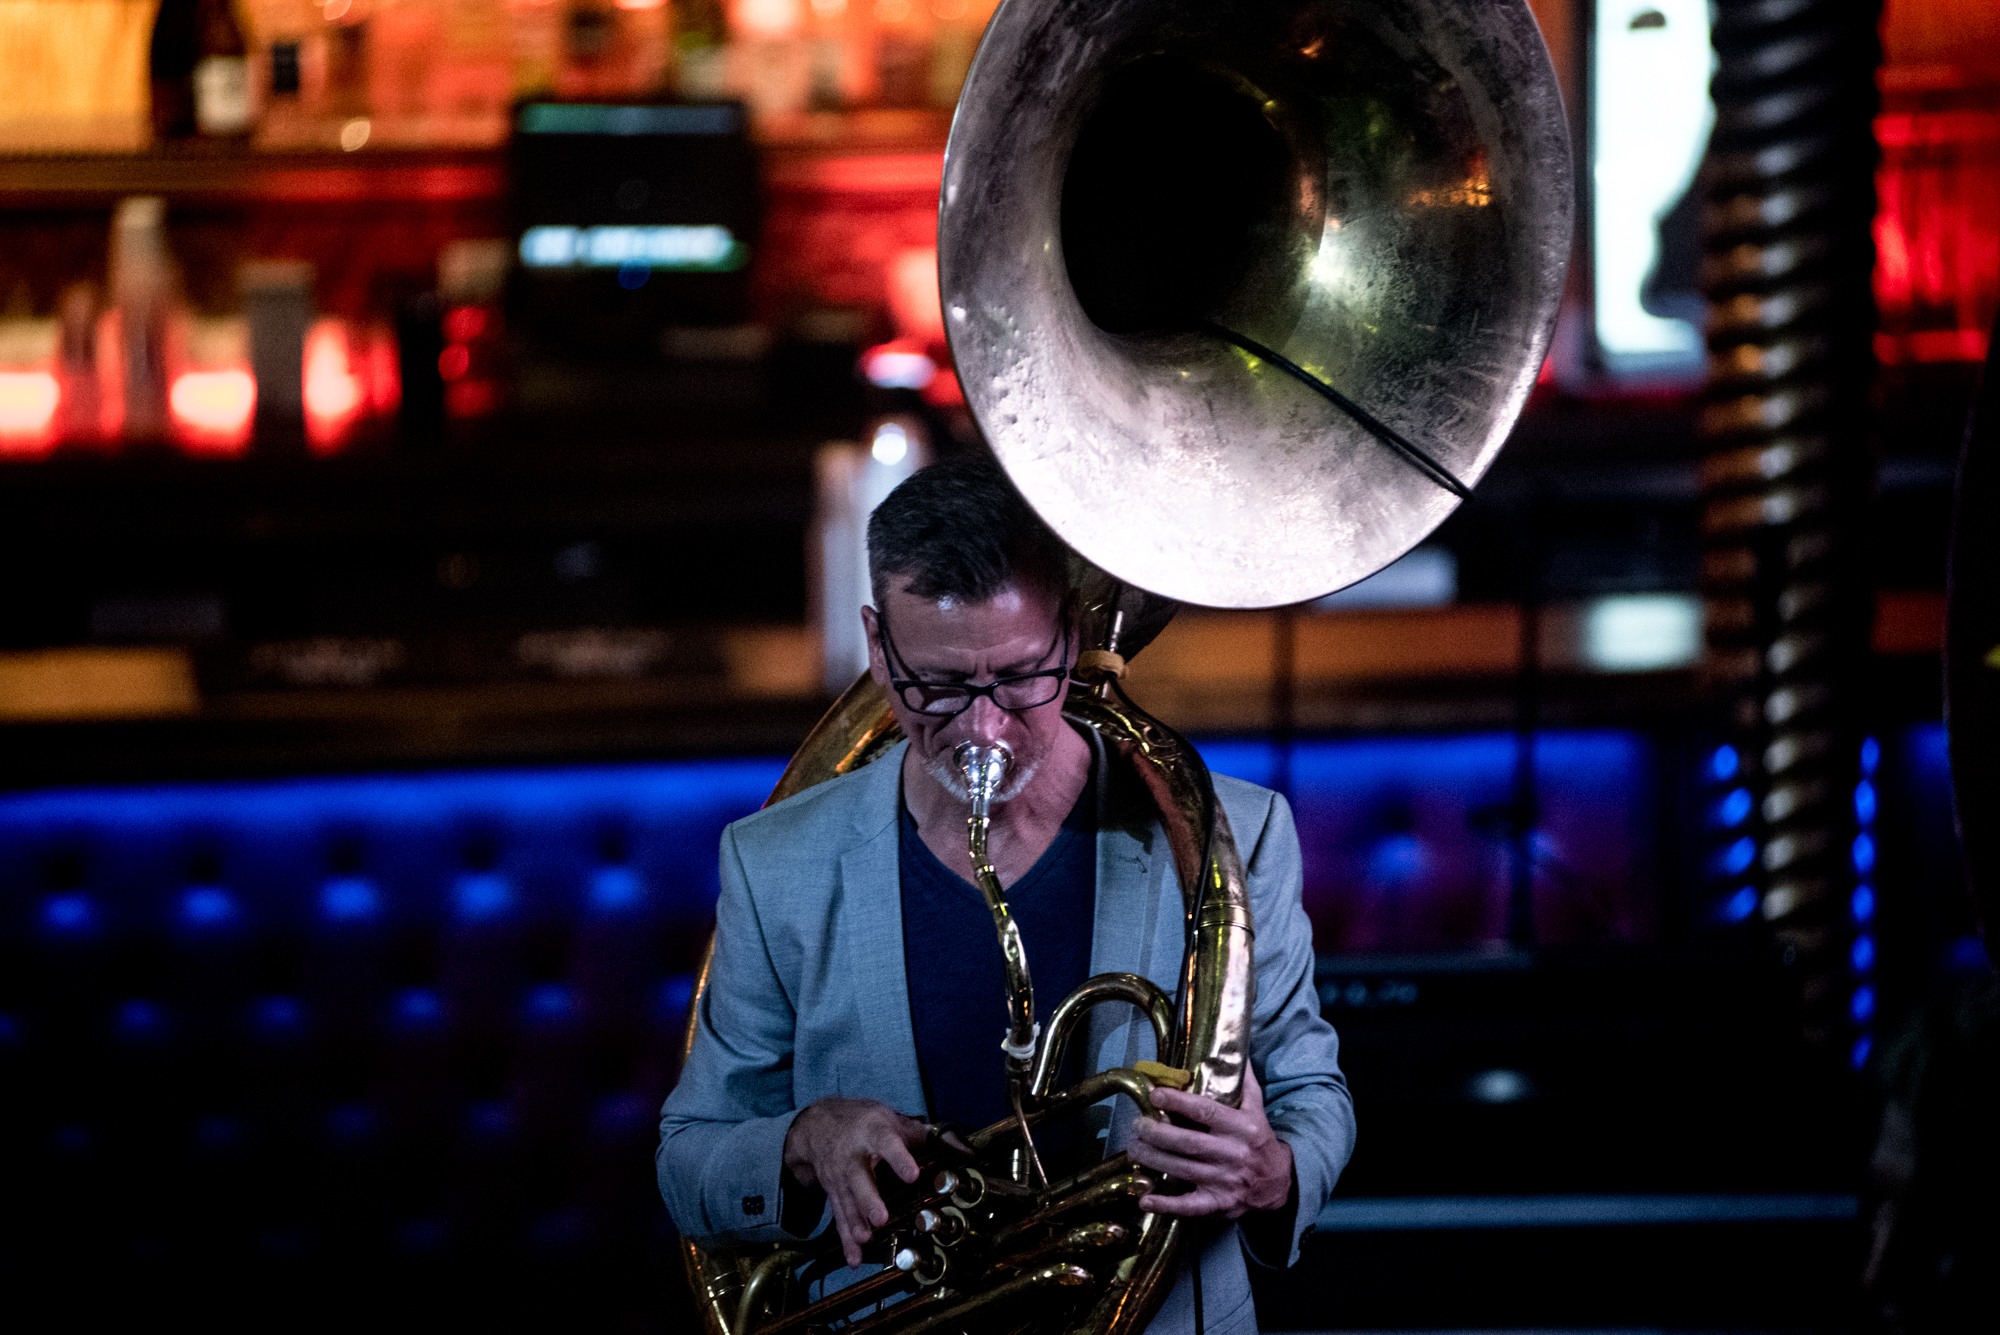 Marc Bolin: The Mudbug Brass Band